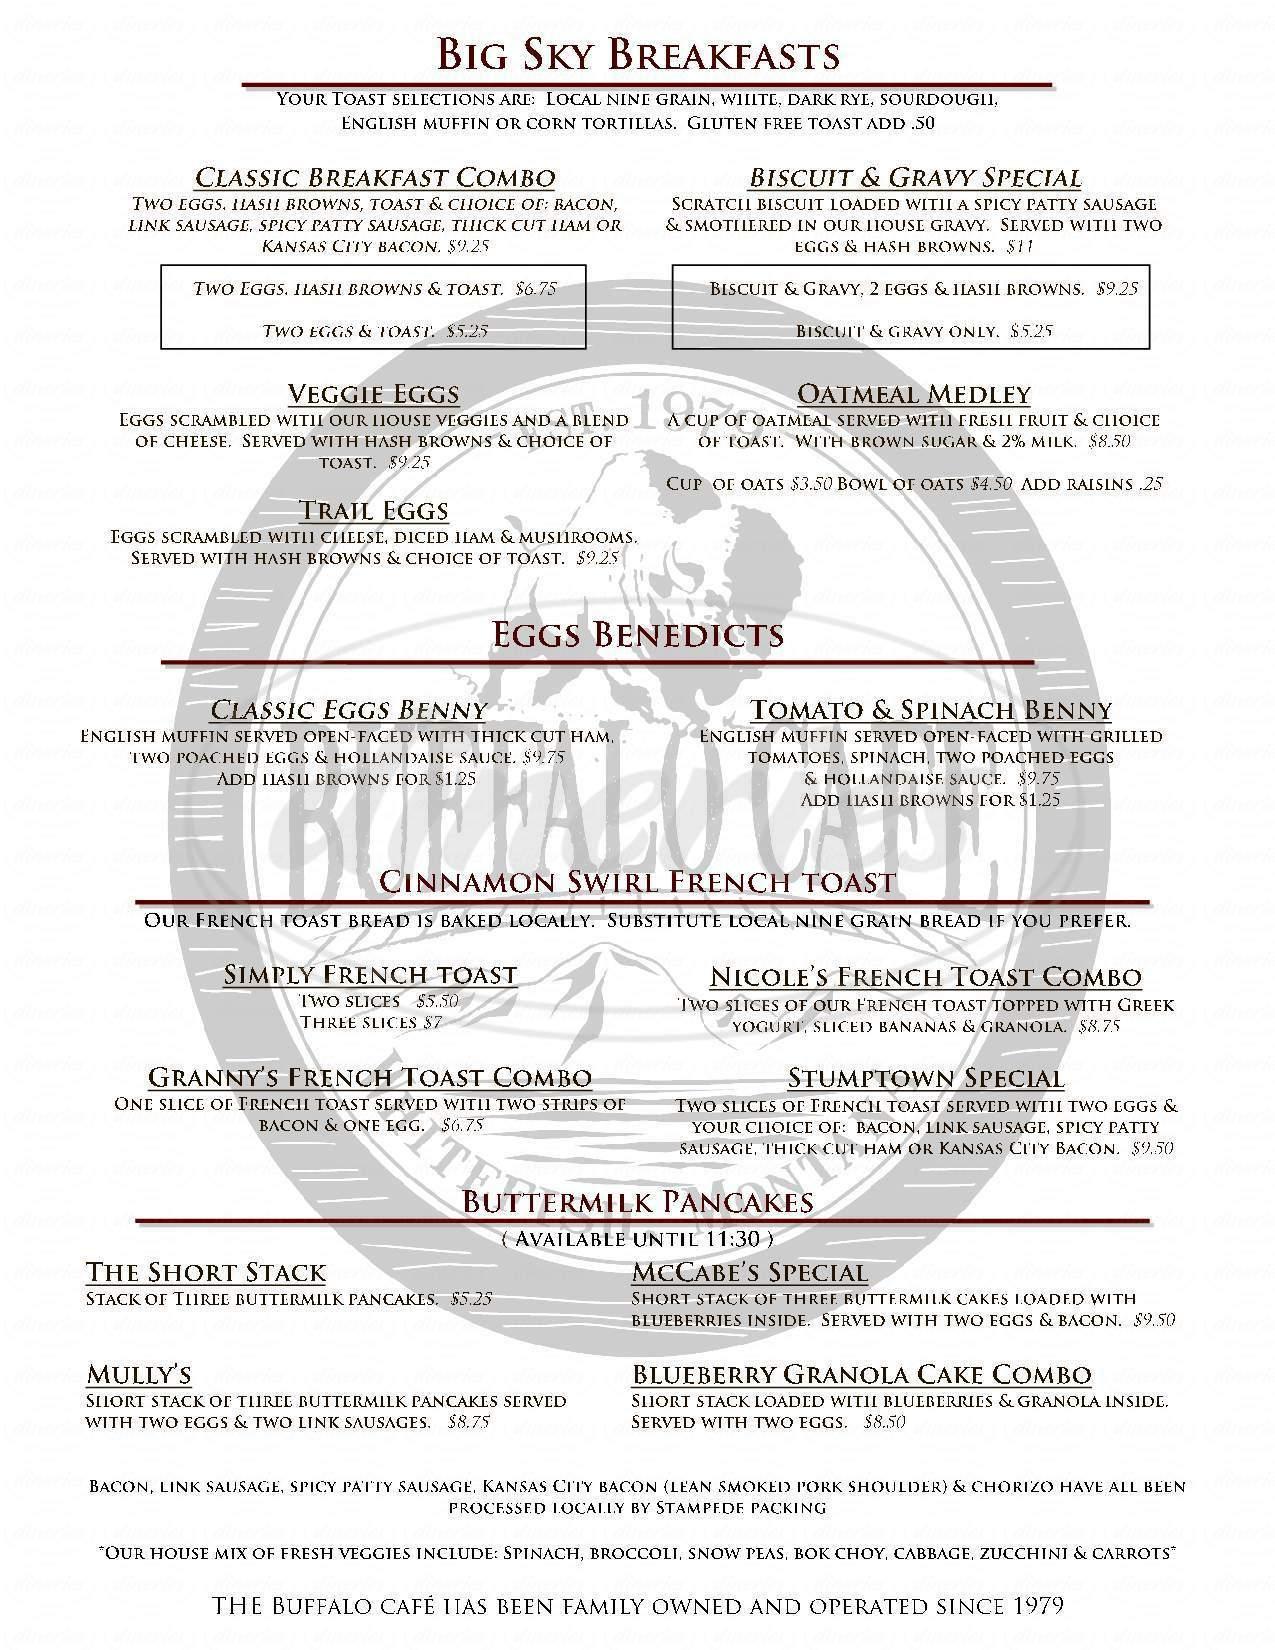 menu for Buffalo Cafe